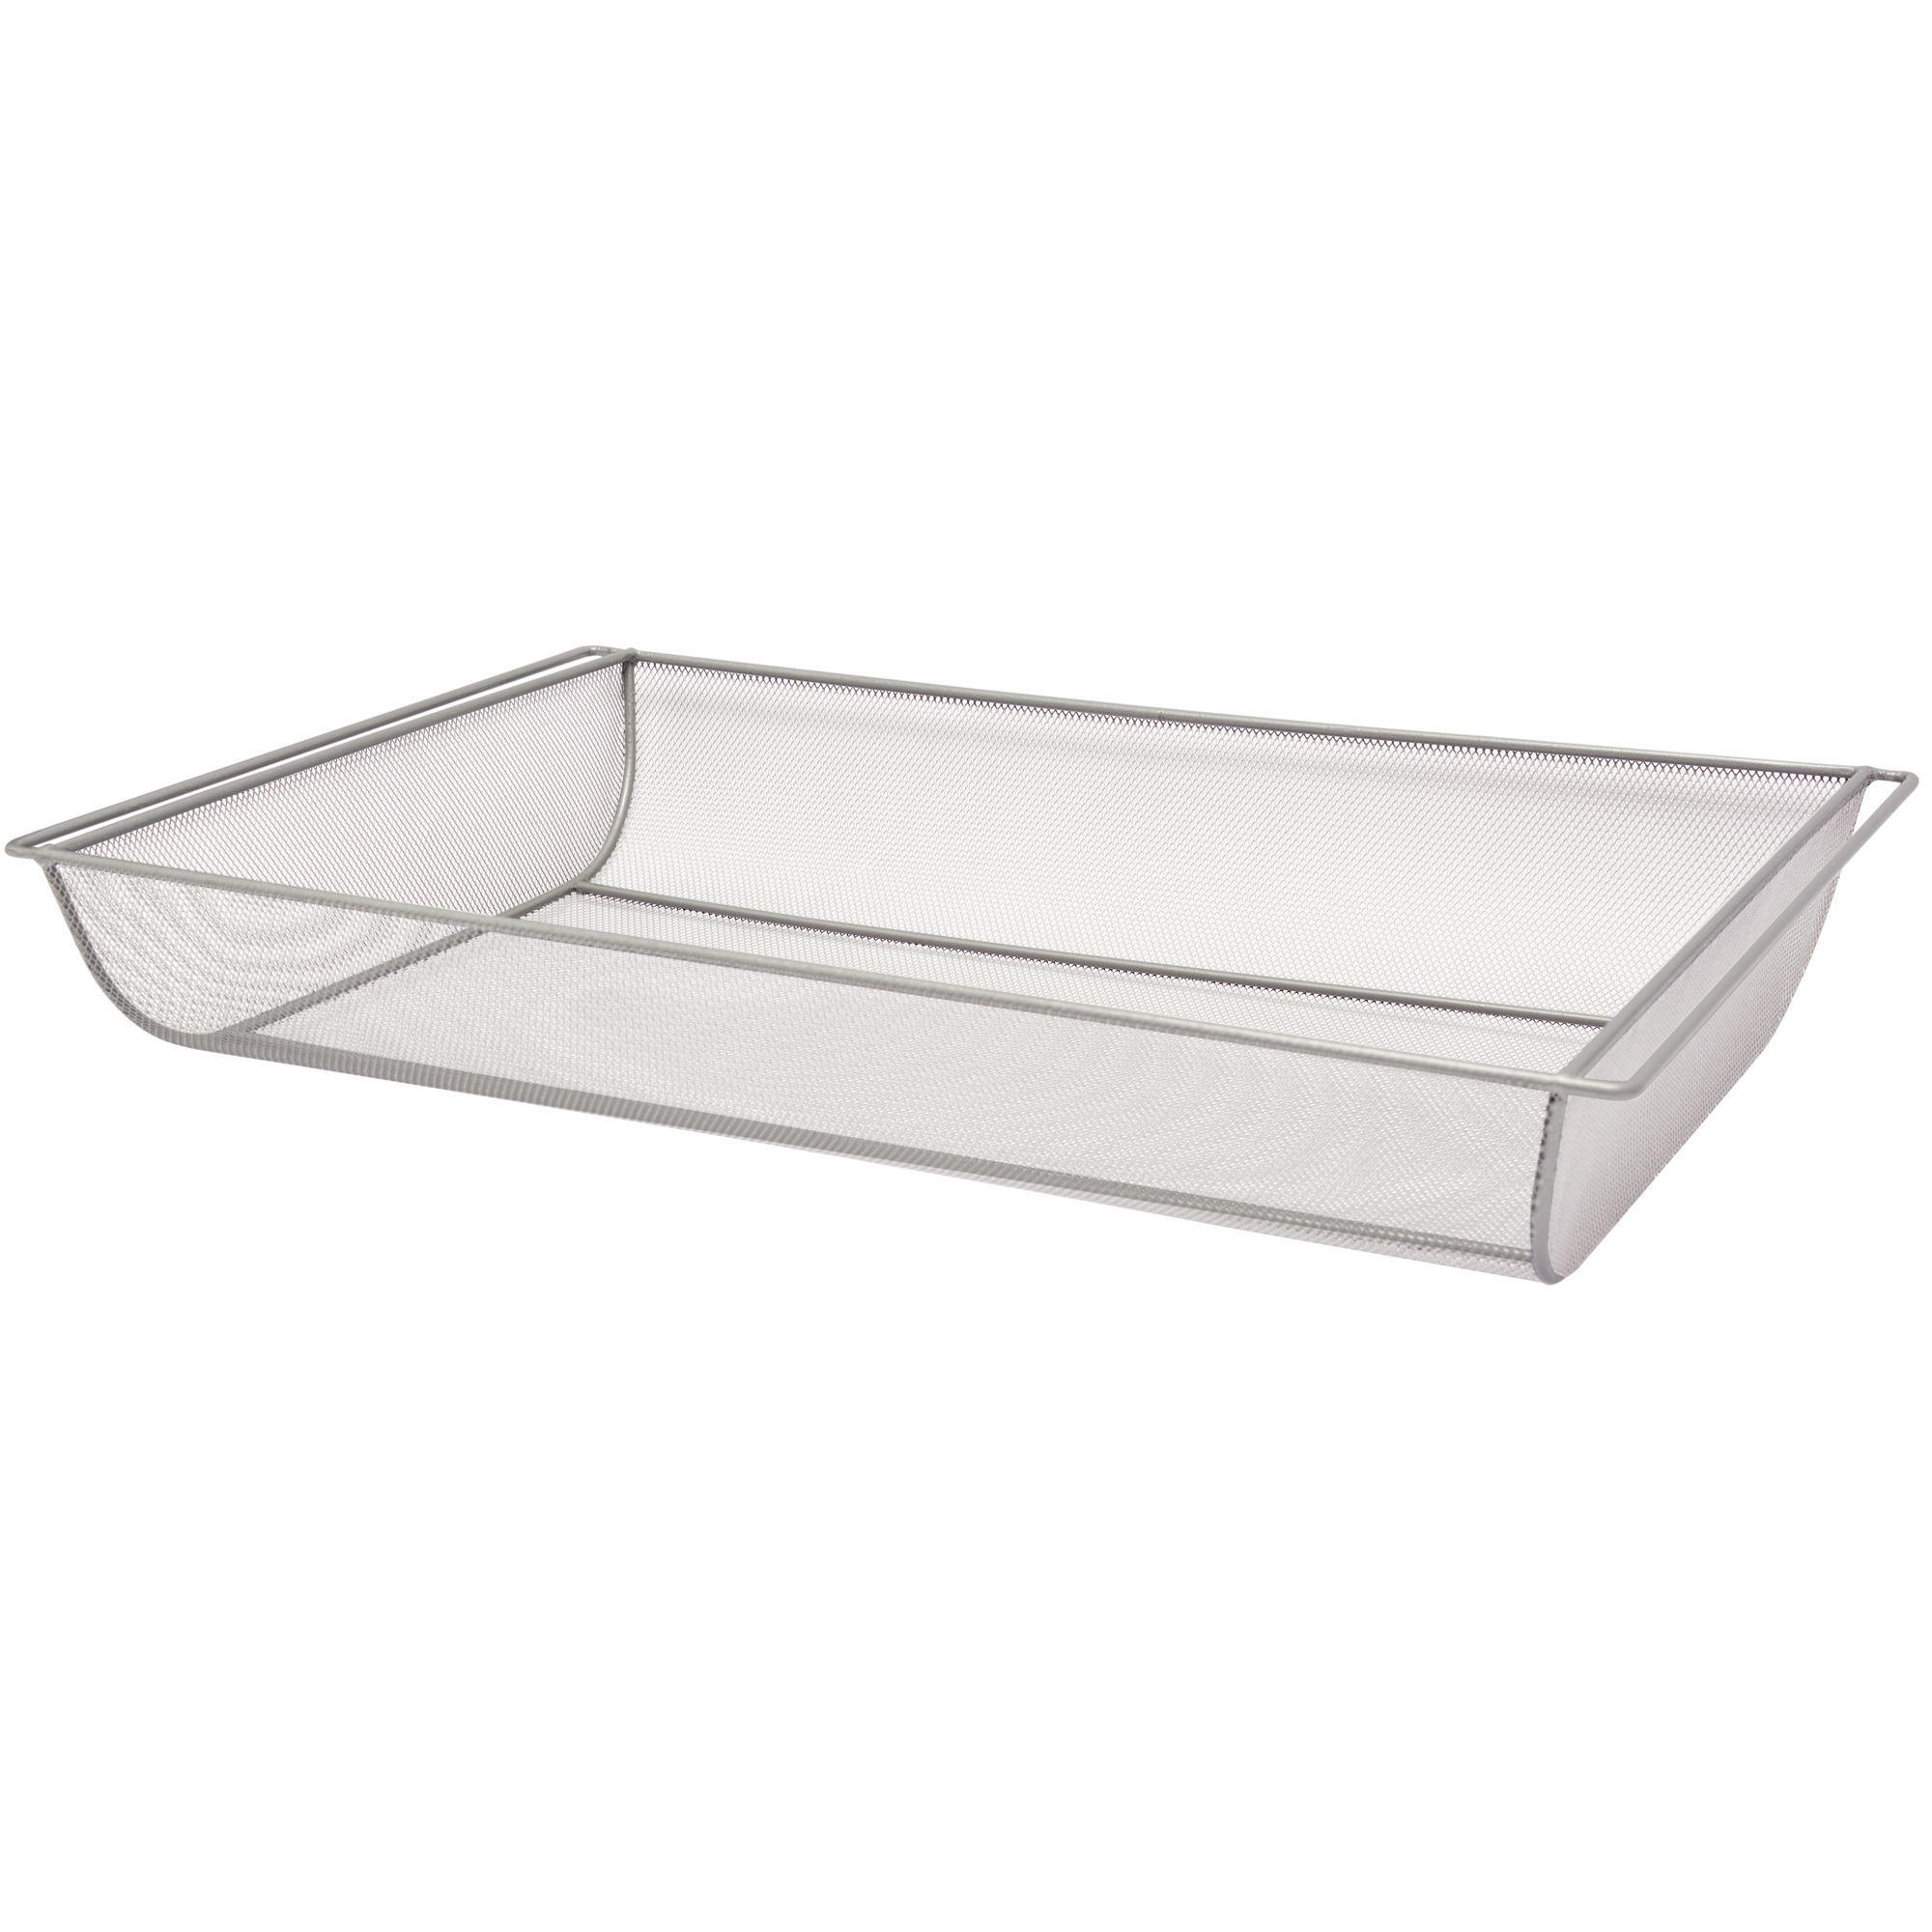 Form Twinslot Silver Storage Basket (w)580mm (l)586 Mm